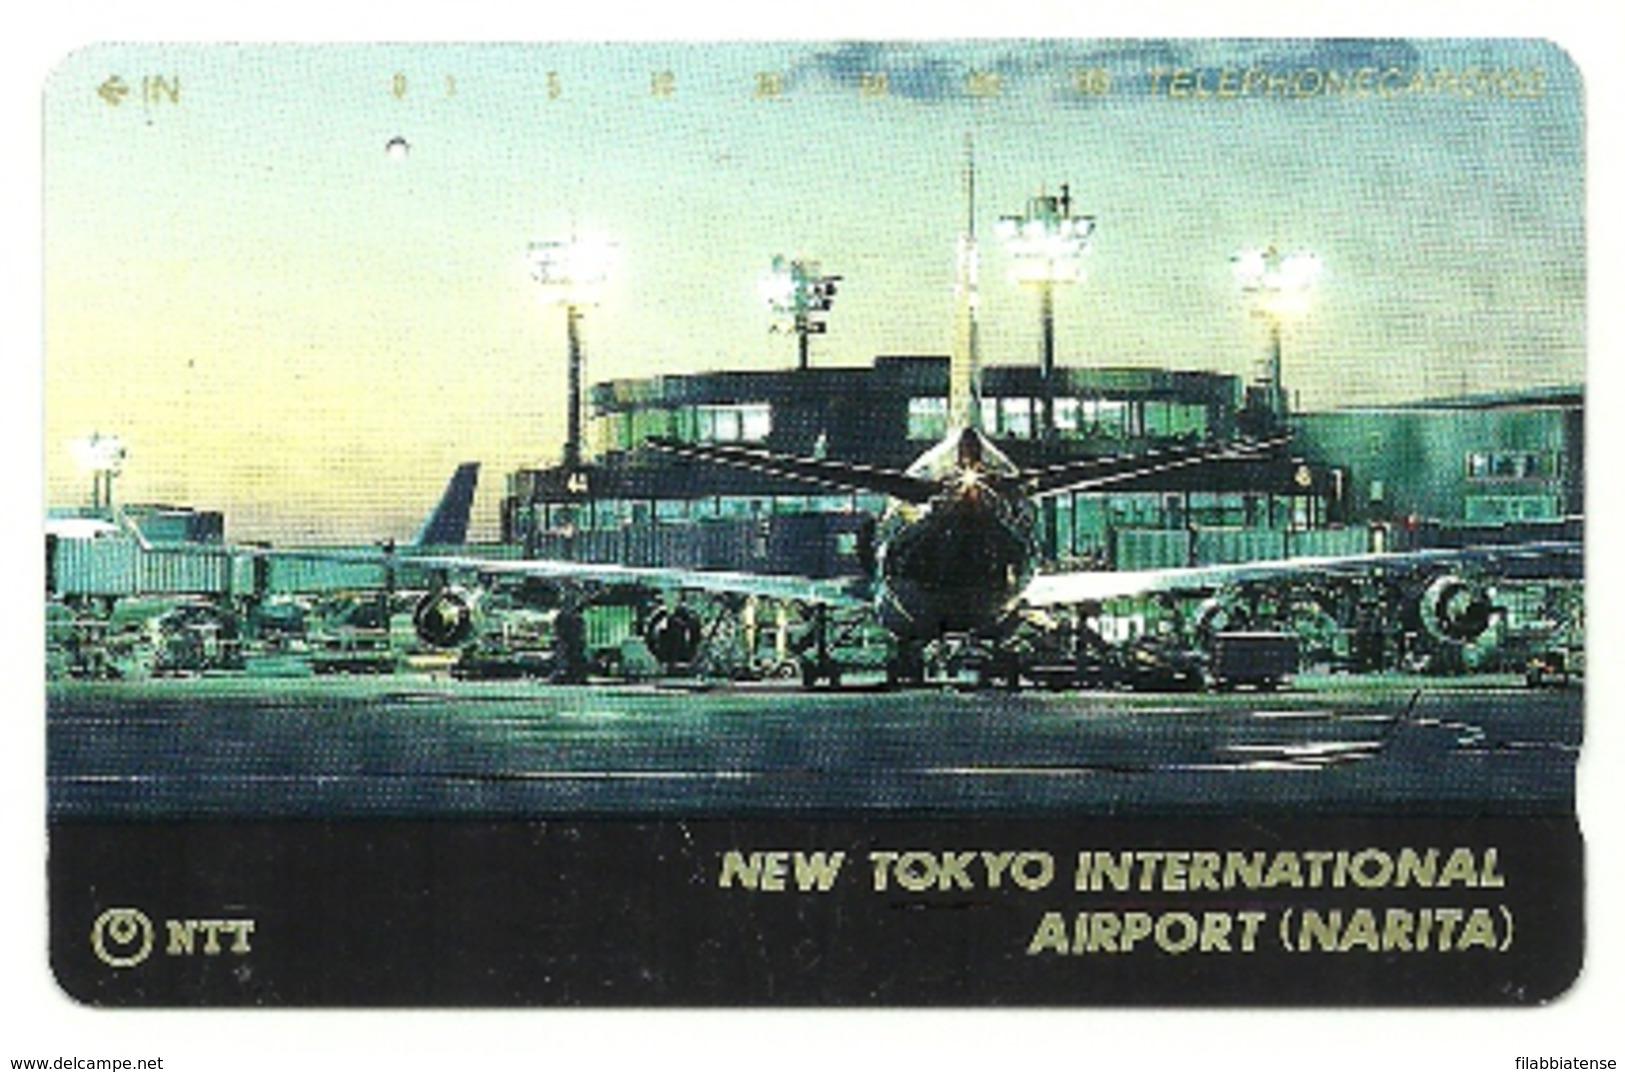 Giappone - Tessera Telefonica Da 105 Units T175 - NTT, - Avions